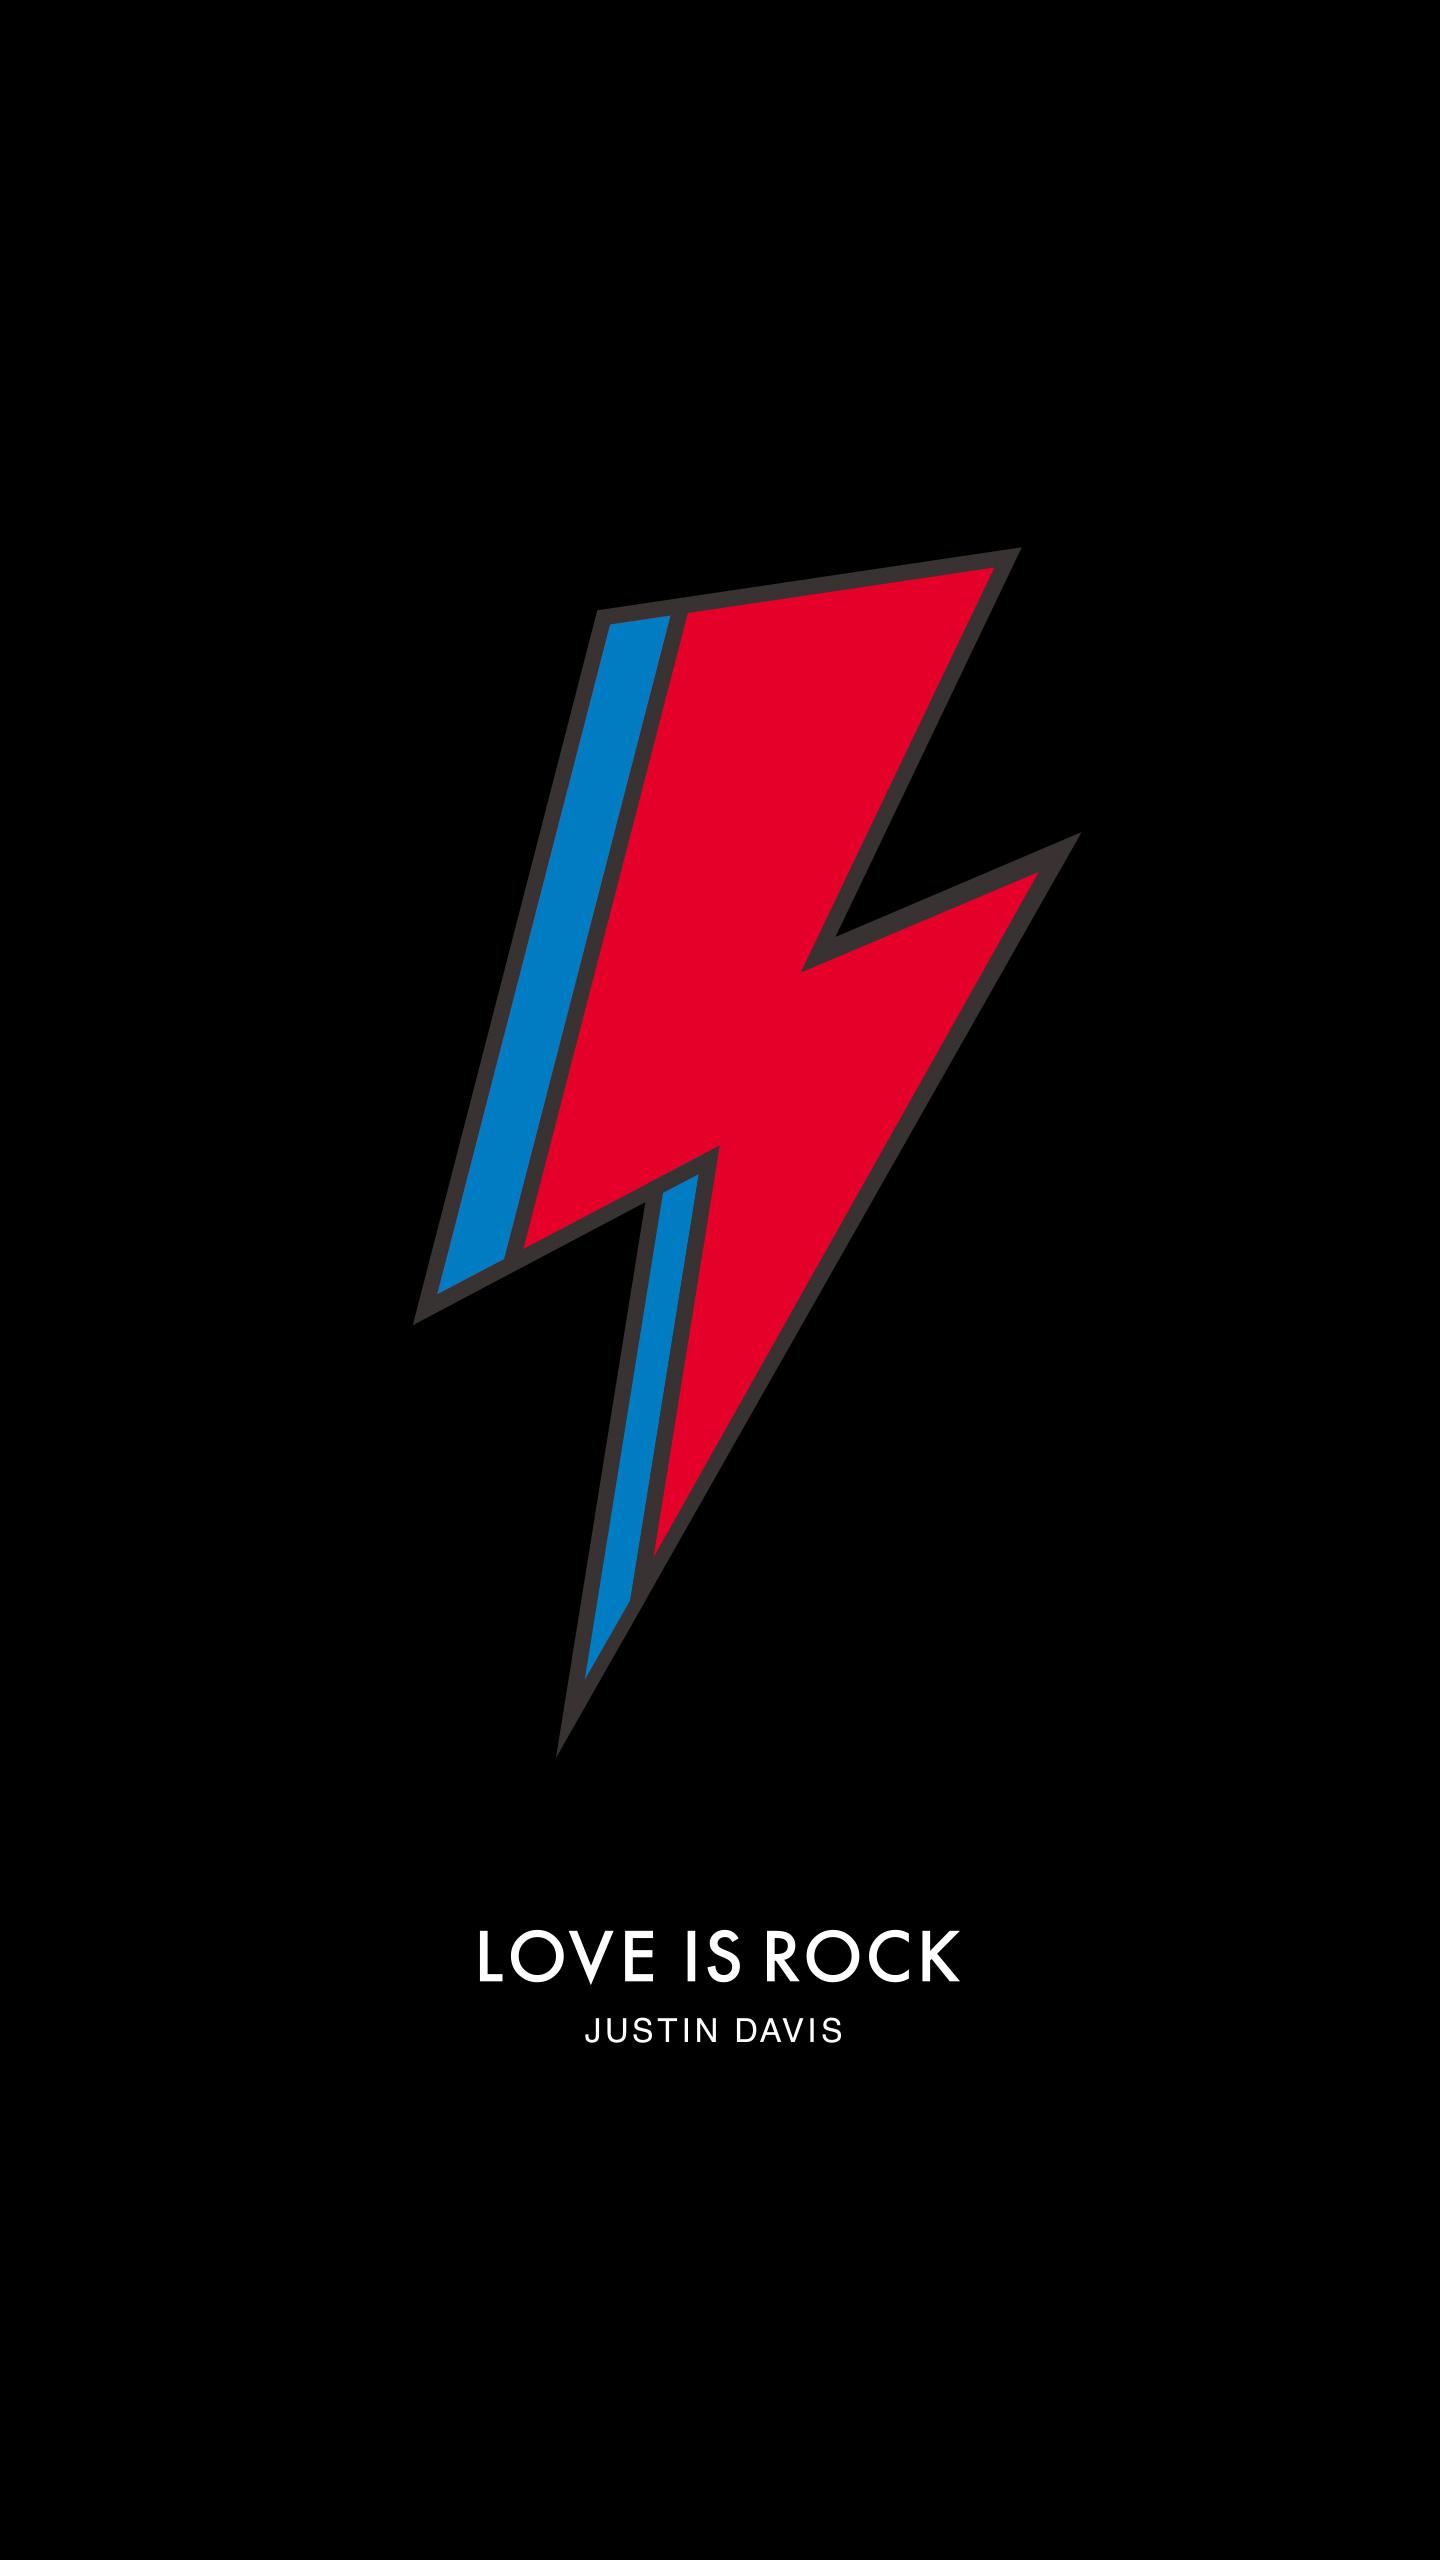 Love Is Rock Justin Davis